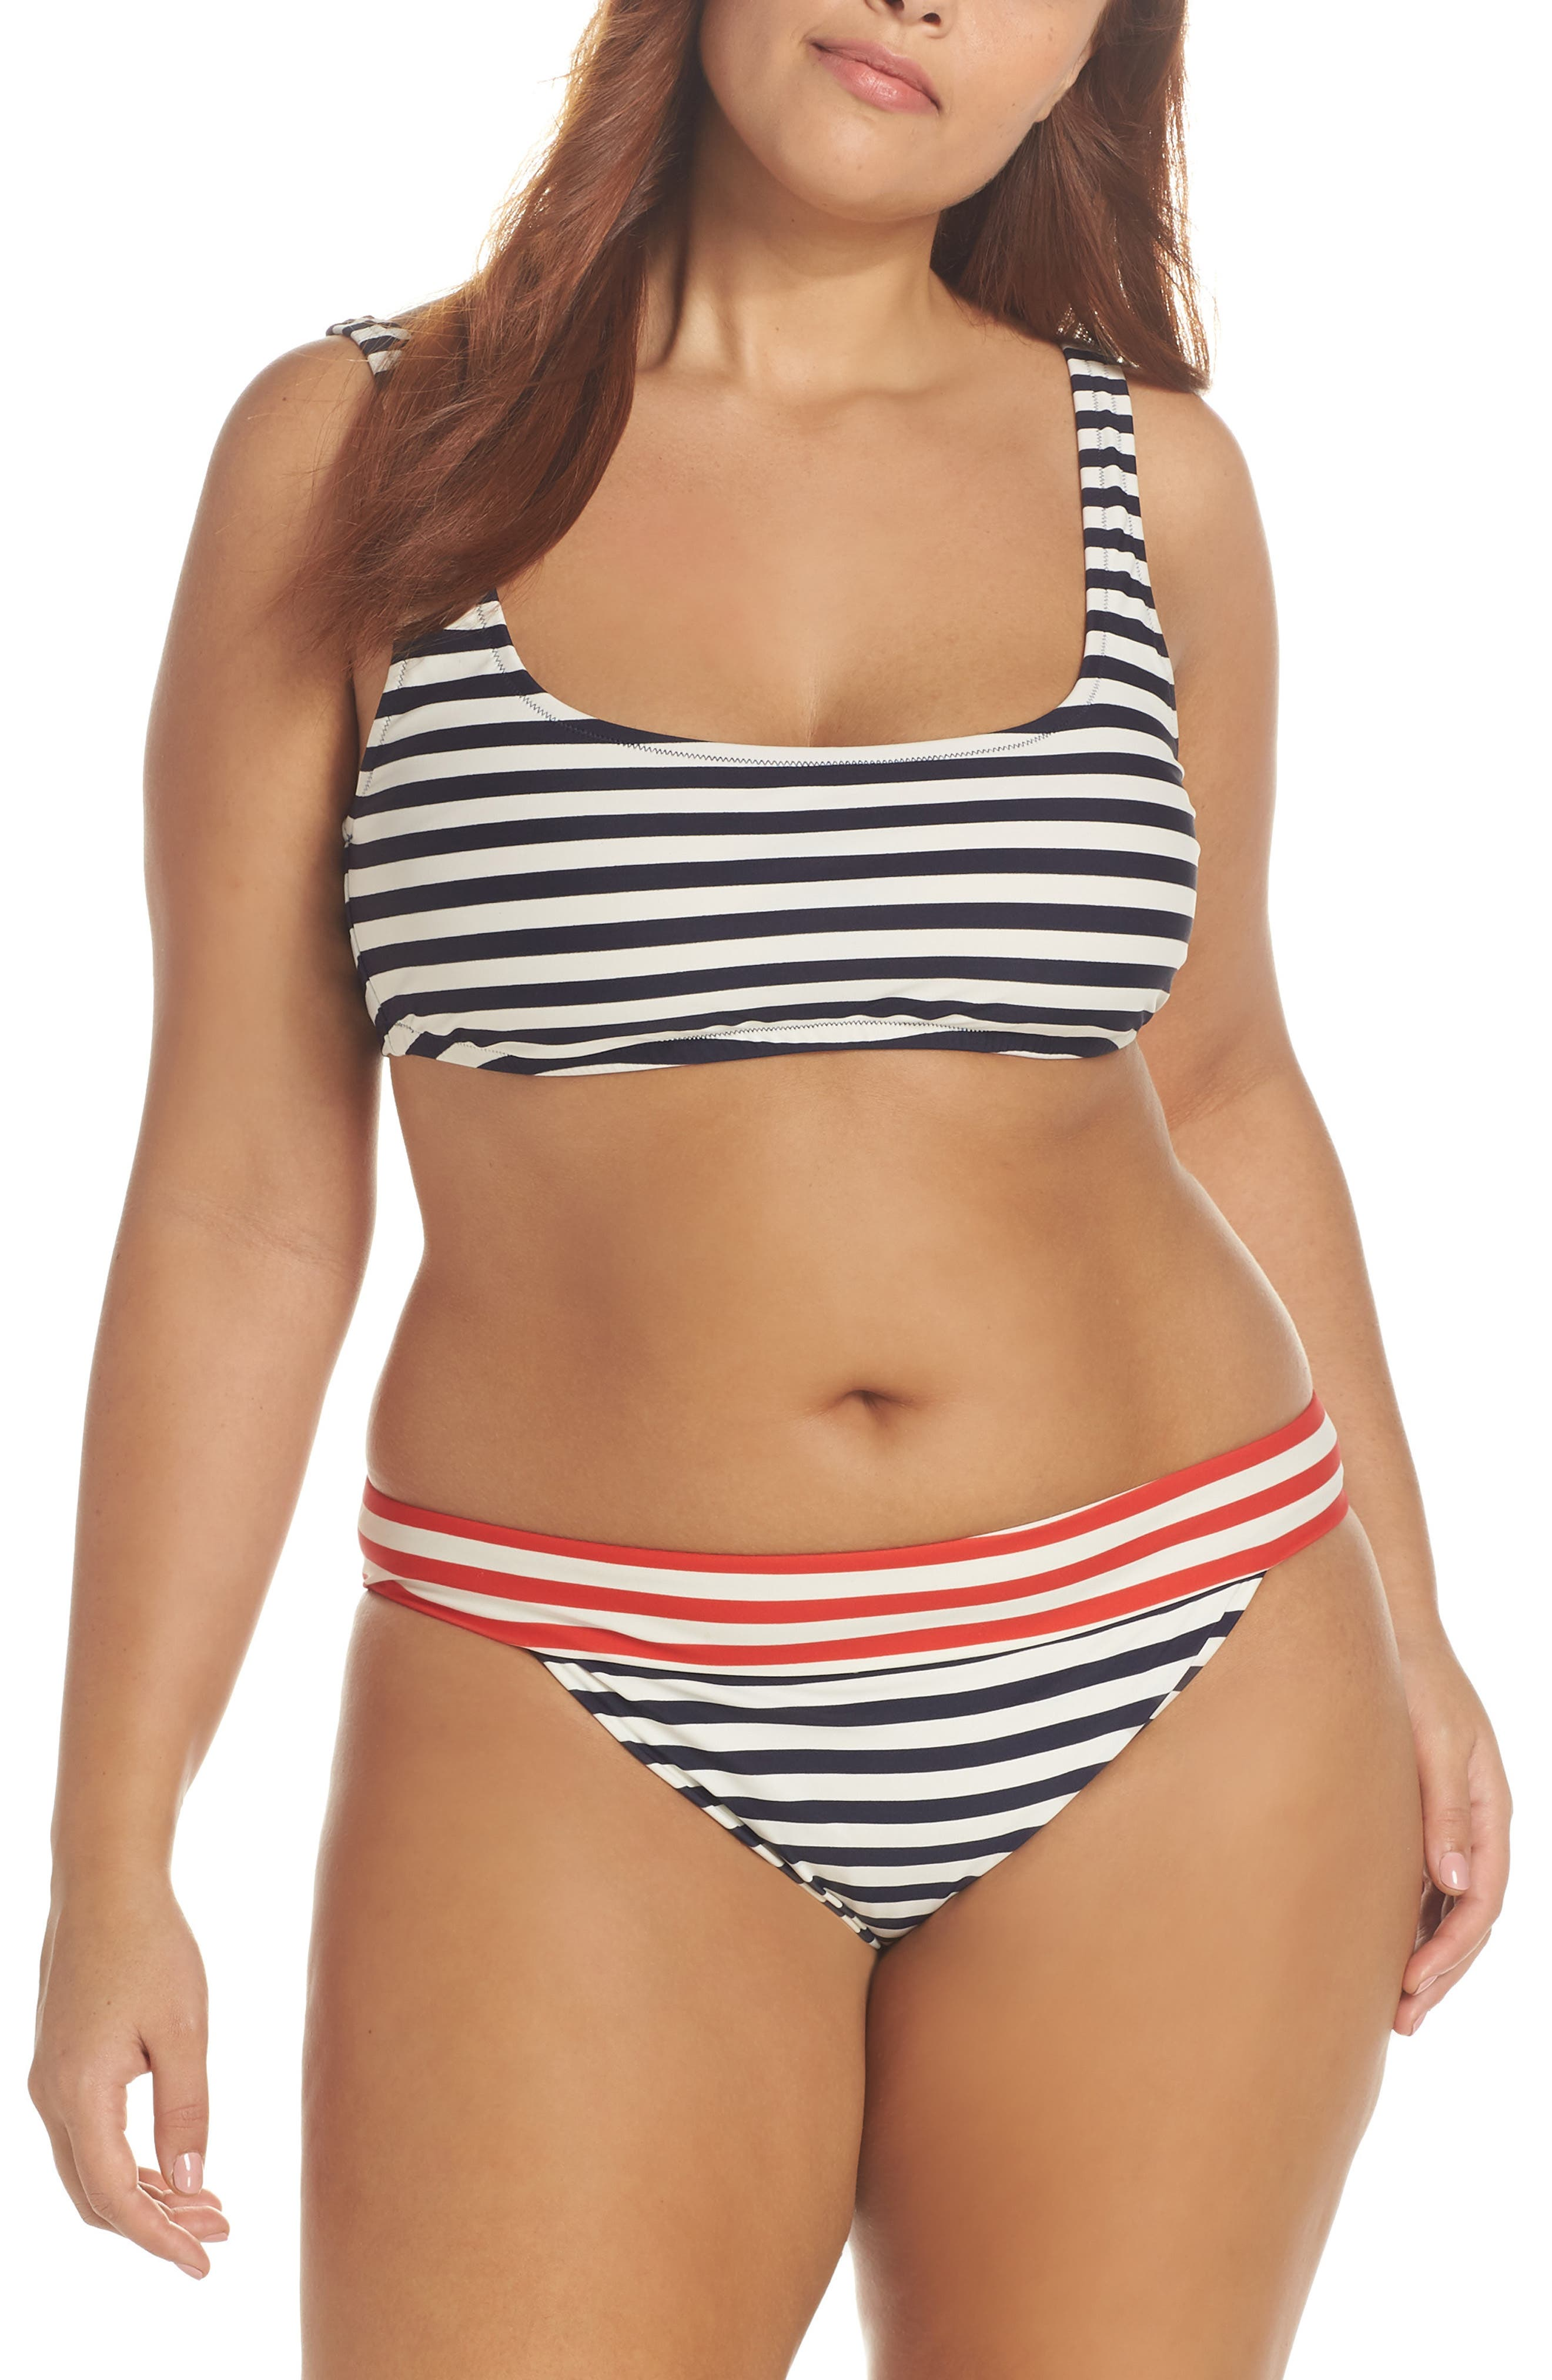 Stripe Banded Bikini Bottoms,                             Alternate thumbnail 7, color,                             NAVY VIVID FLAME